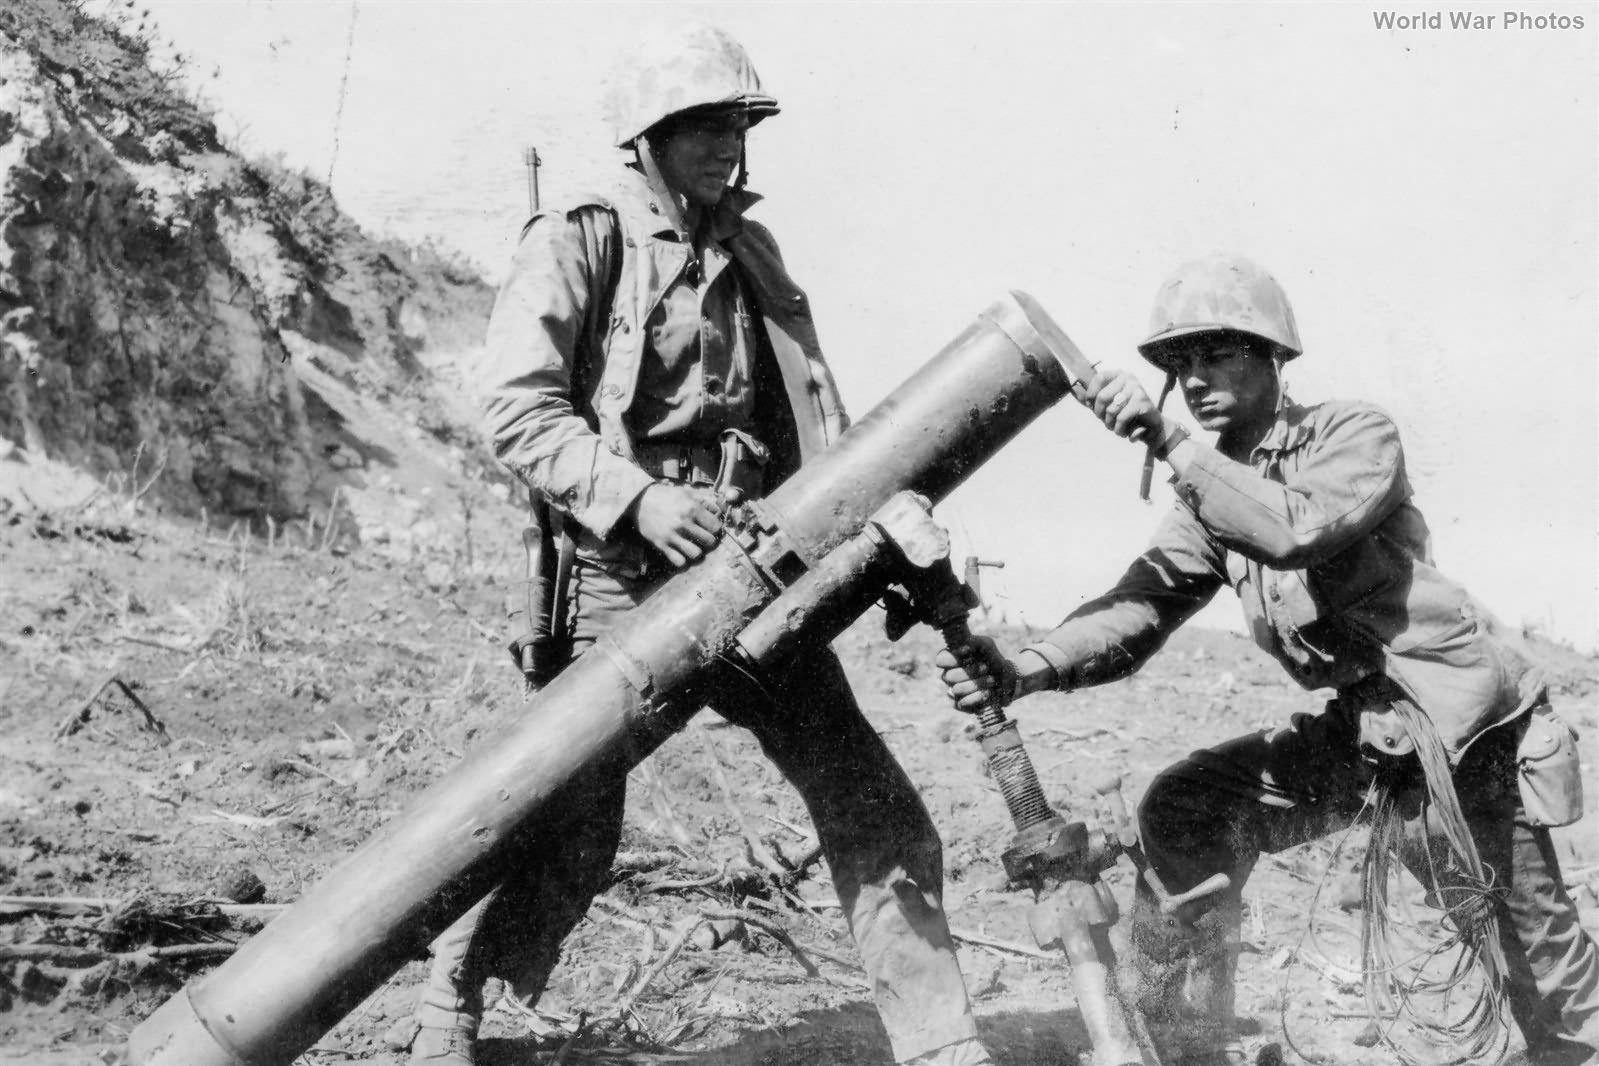 Marines with massive 155mm Japanese Mortar on Iwo Jima